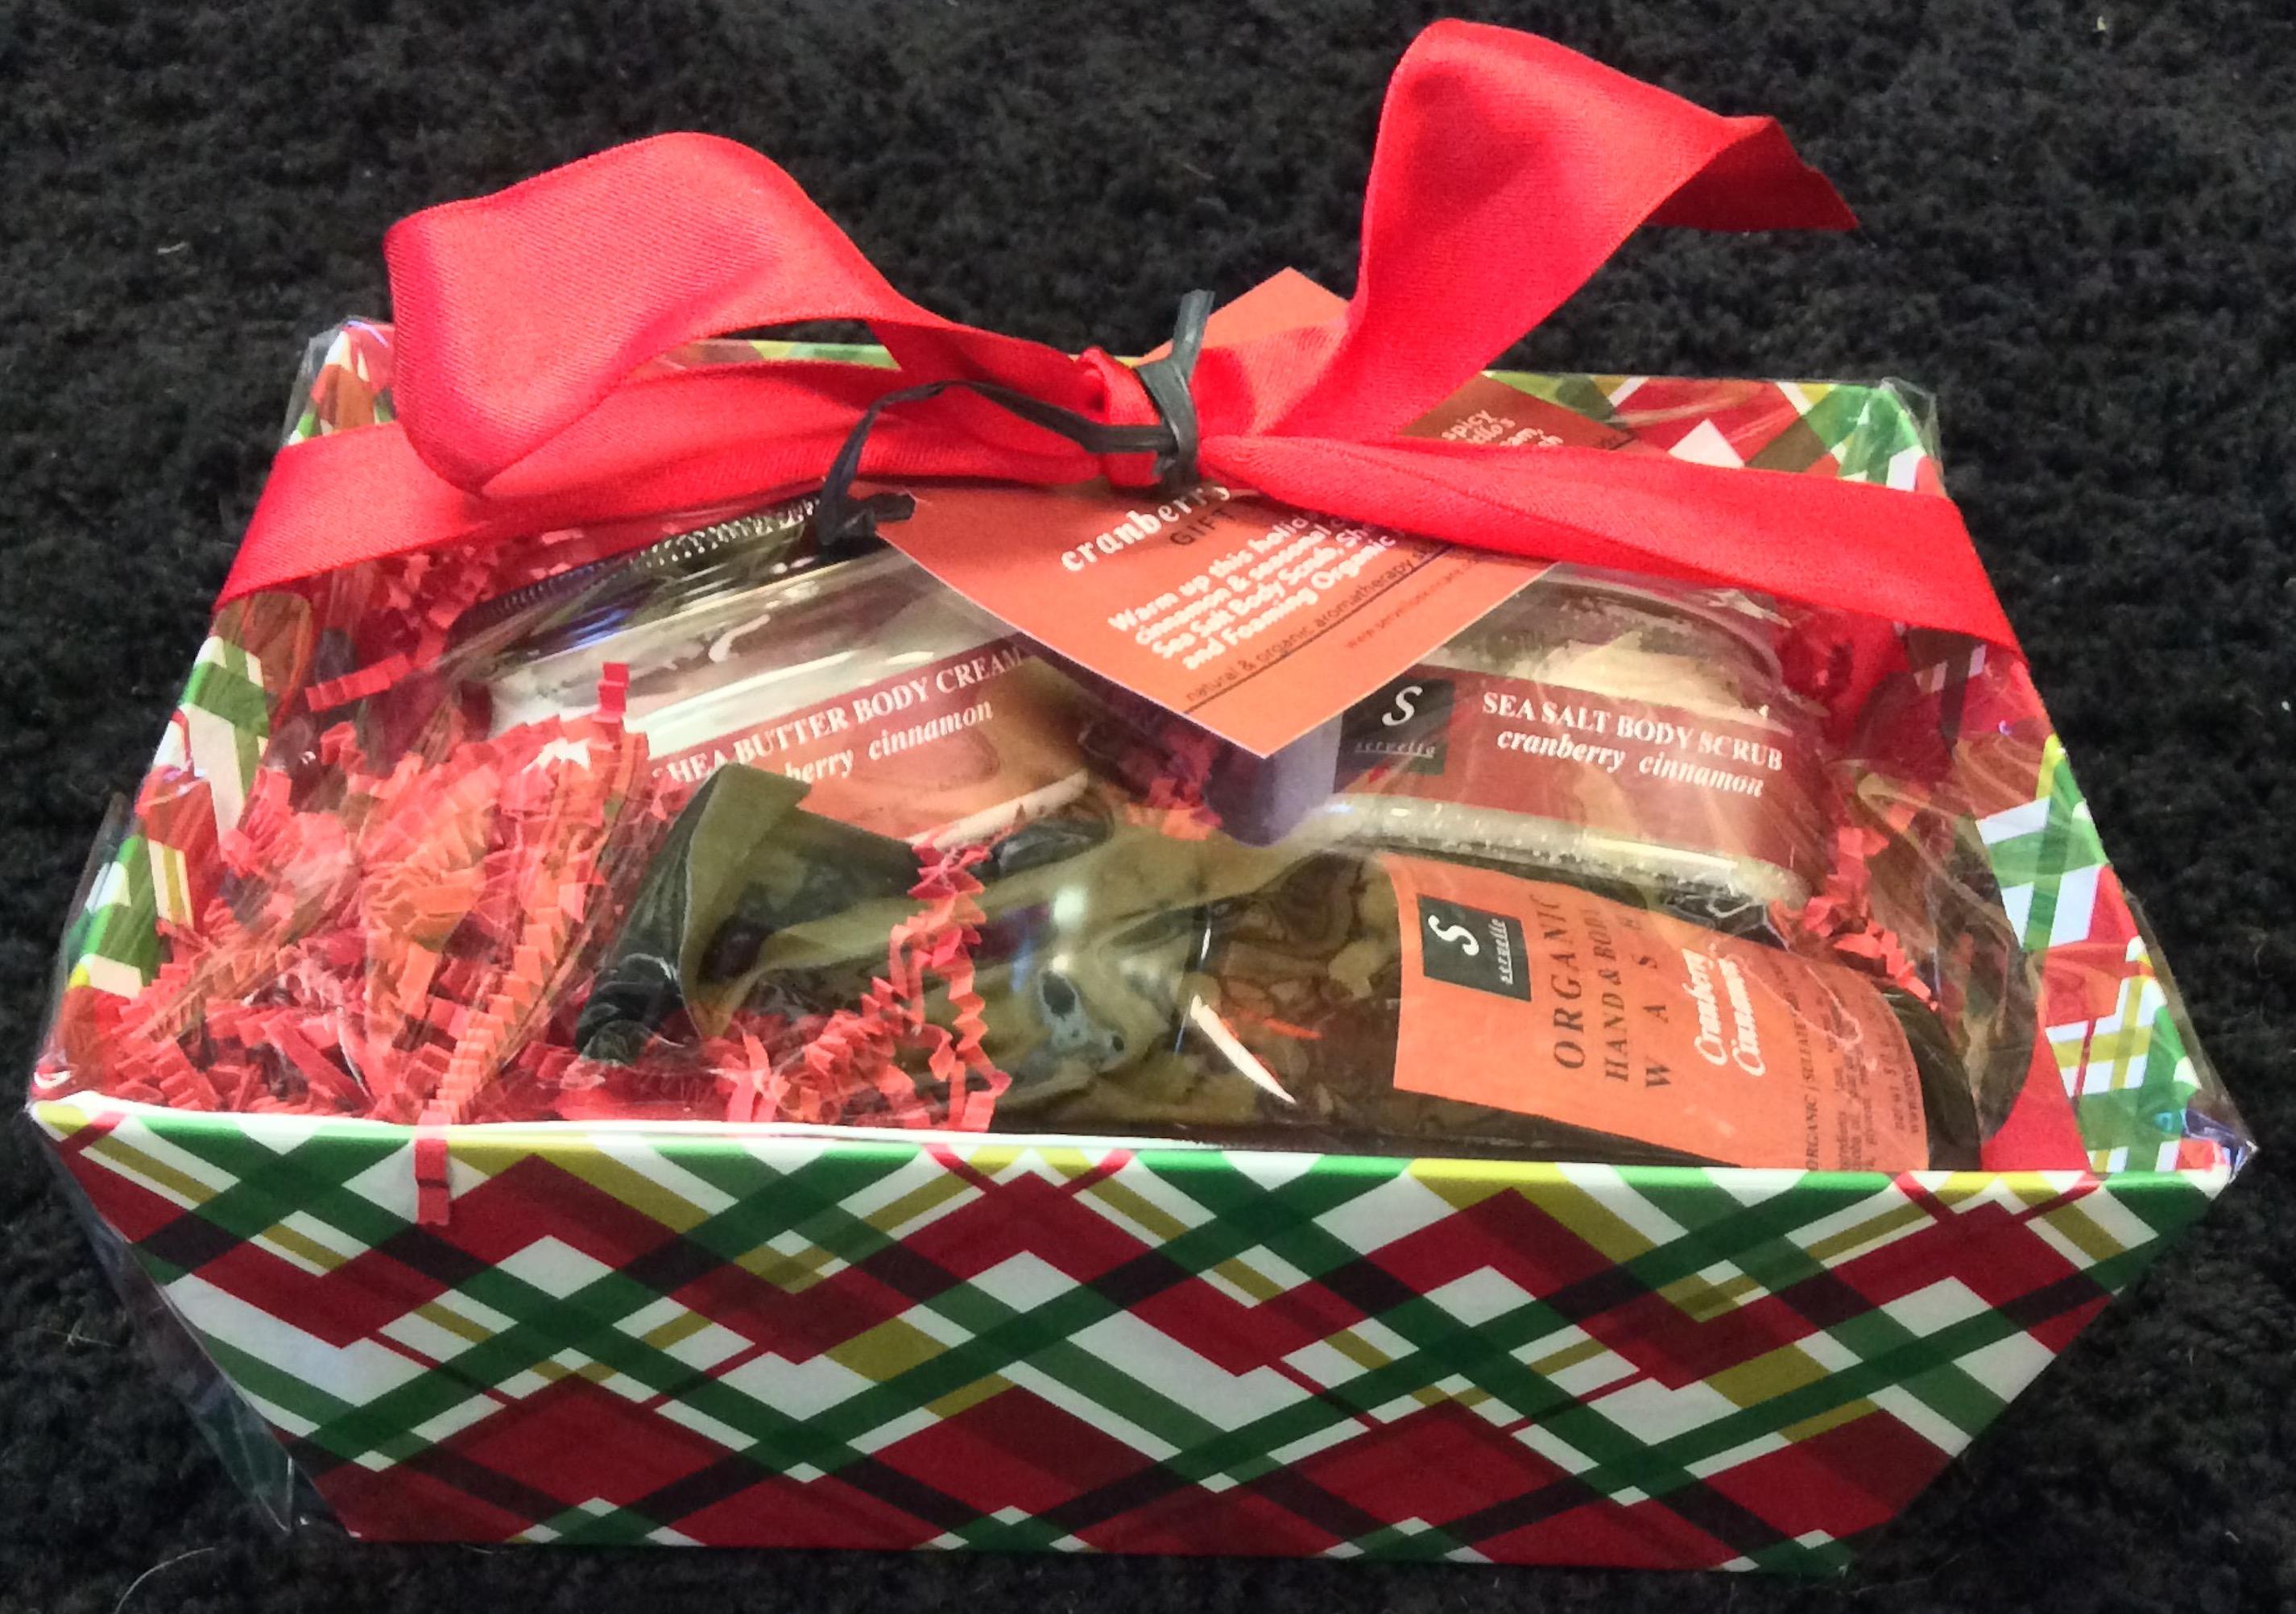 Cranberry Cinnamon Gift Set